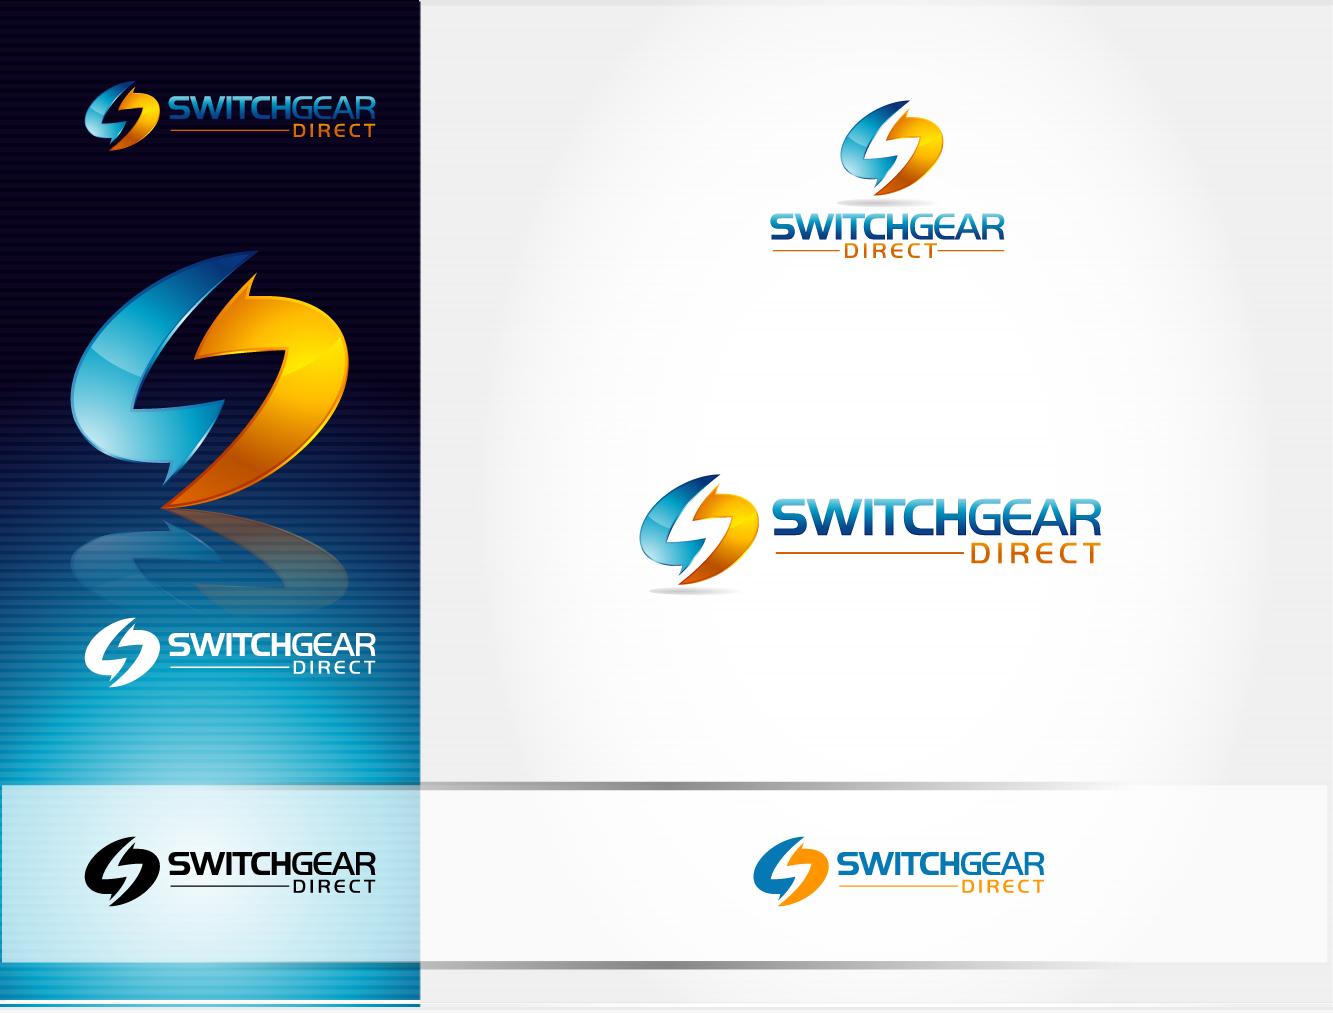 Help SWITCHGEAR DIRECT with a new logo